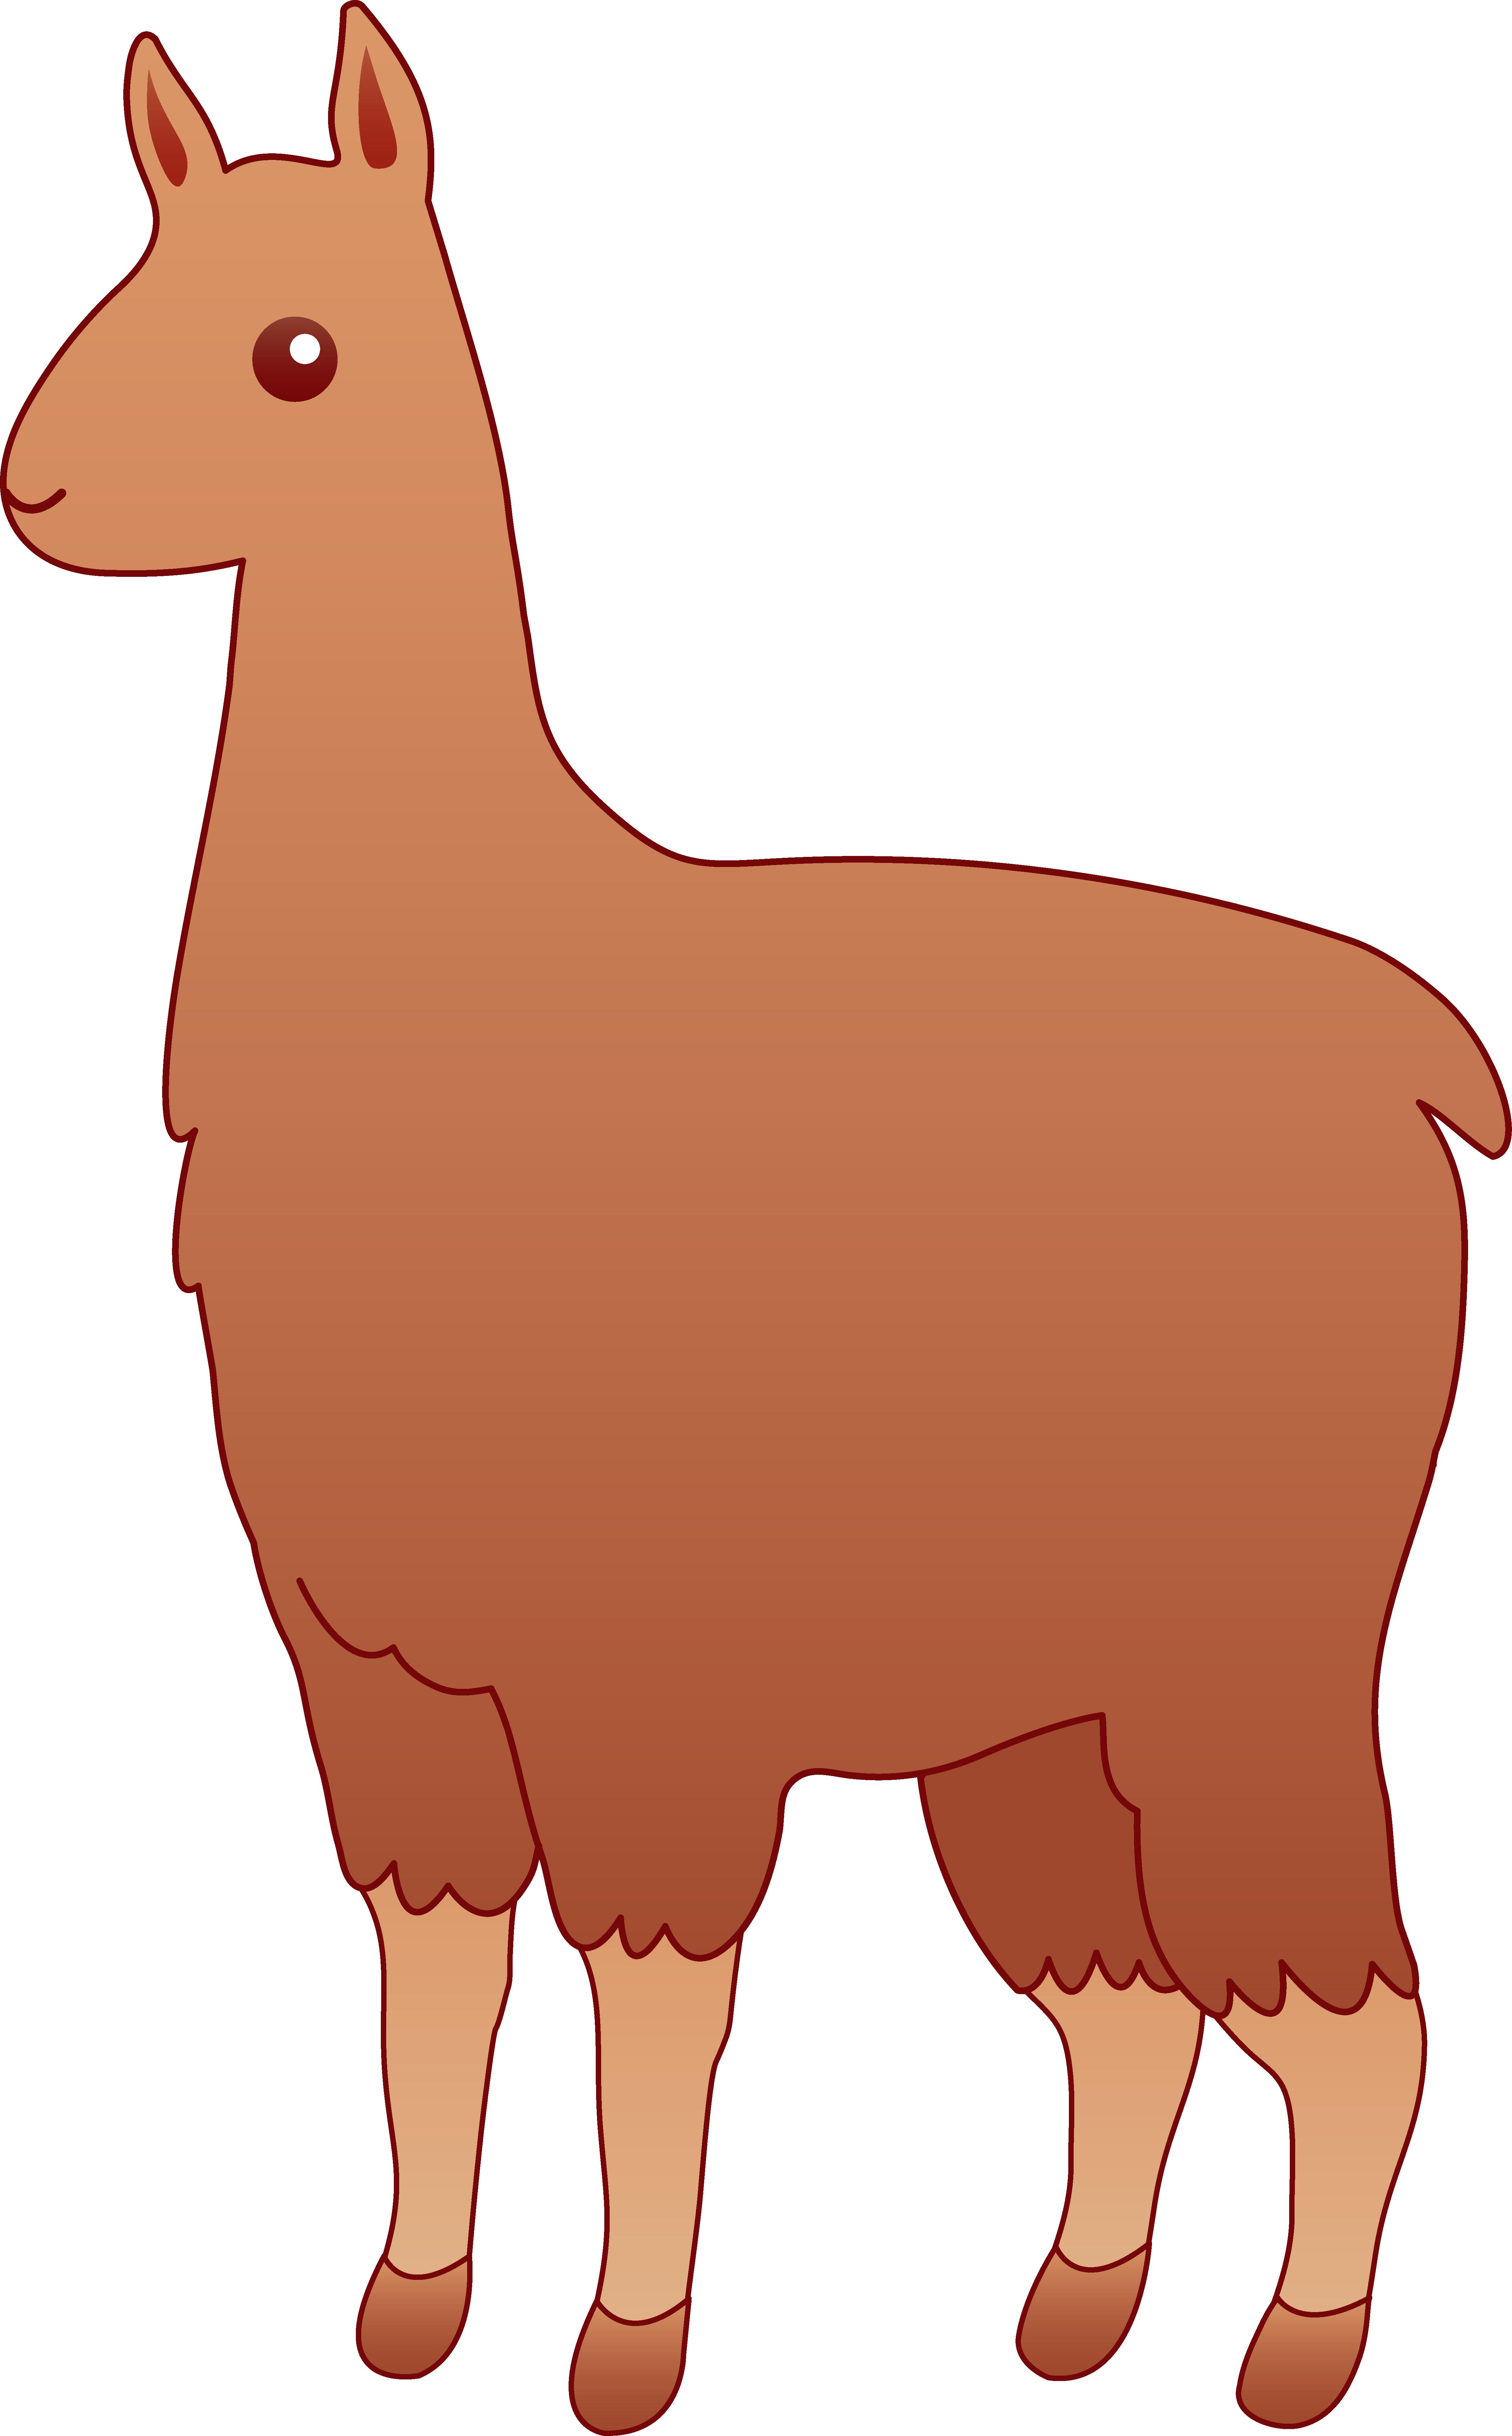 banner royalty free Alpaca clipart. Panda free images alpacaclipart